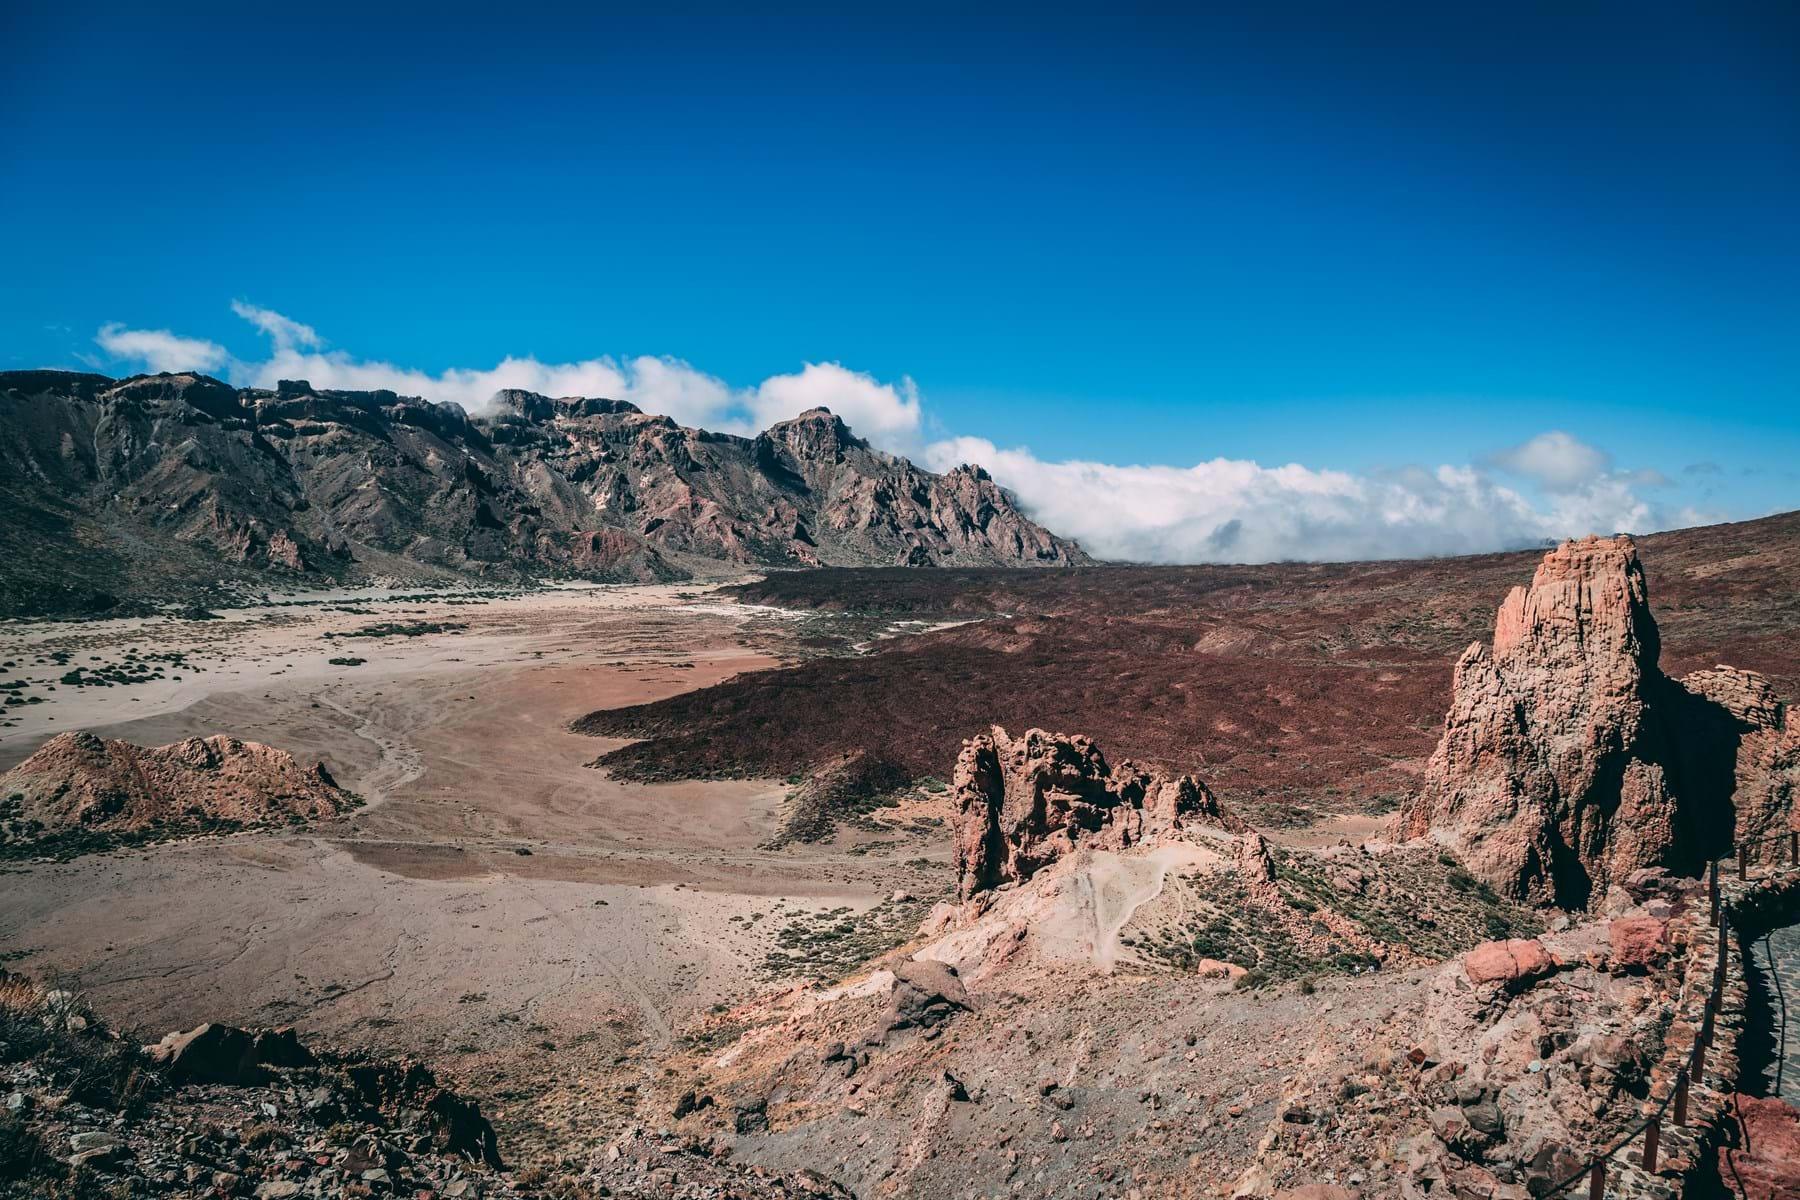 Landscapes Photography - James Baldwin